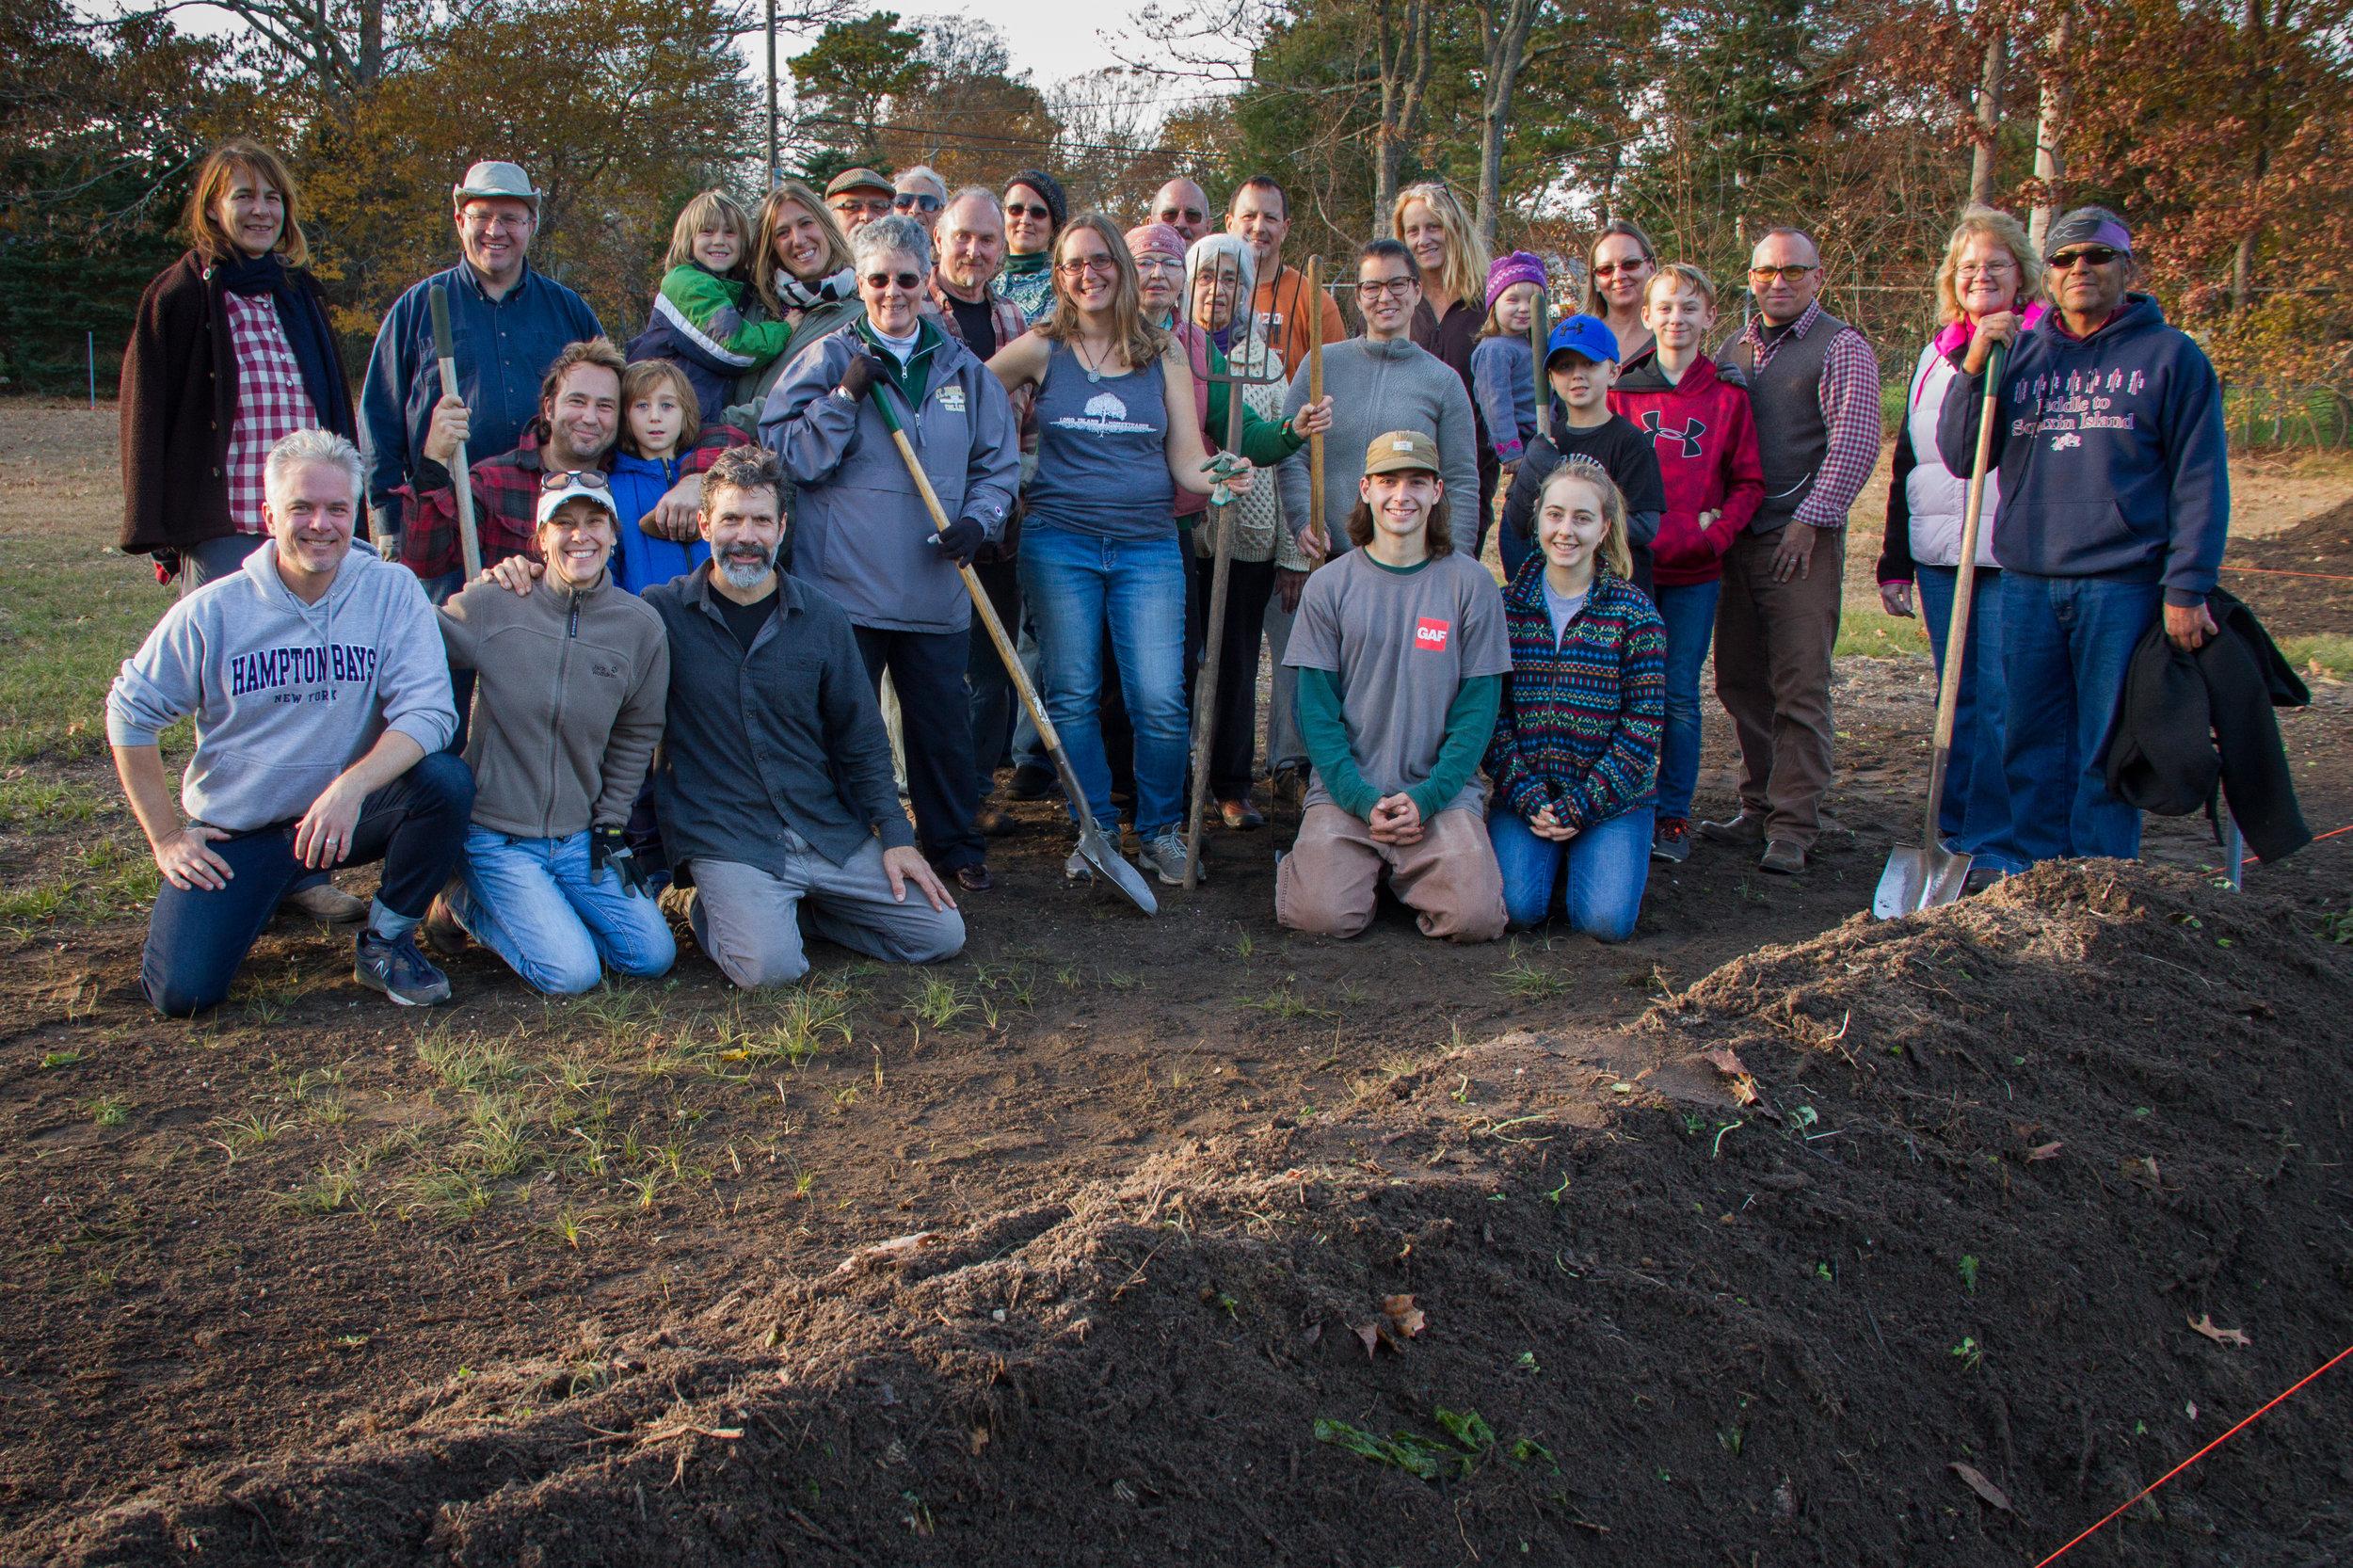 ECI Heritage Gardens Groundbreaking - group photo - Nov 25, 2017.jpg